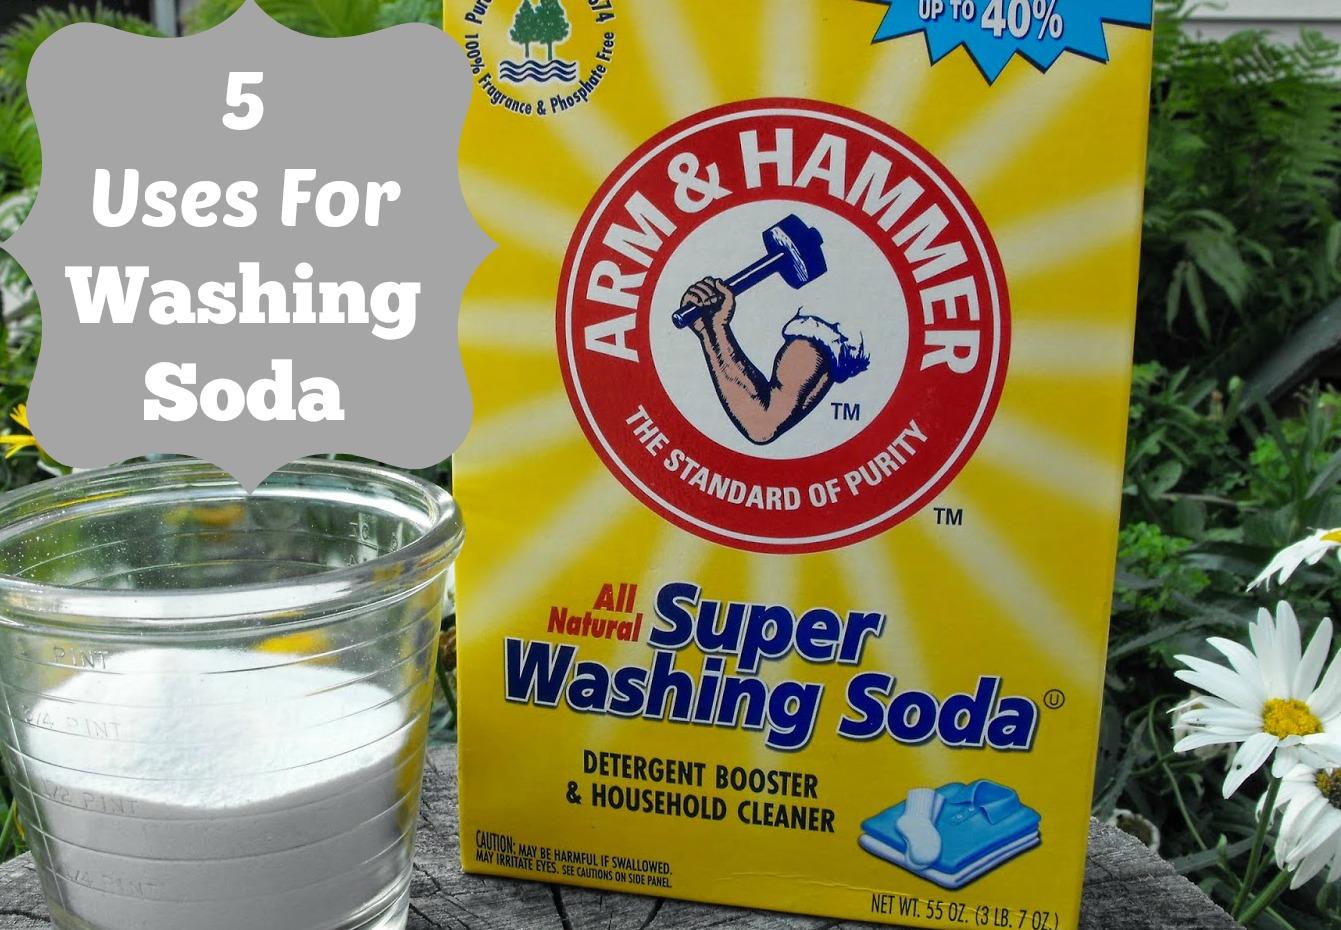 5 uses for washing soda